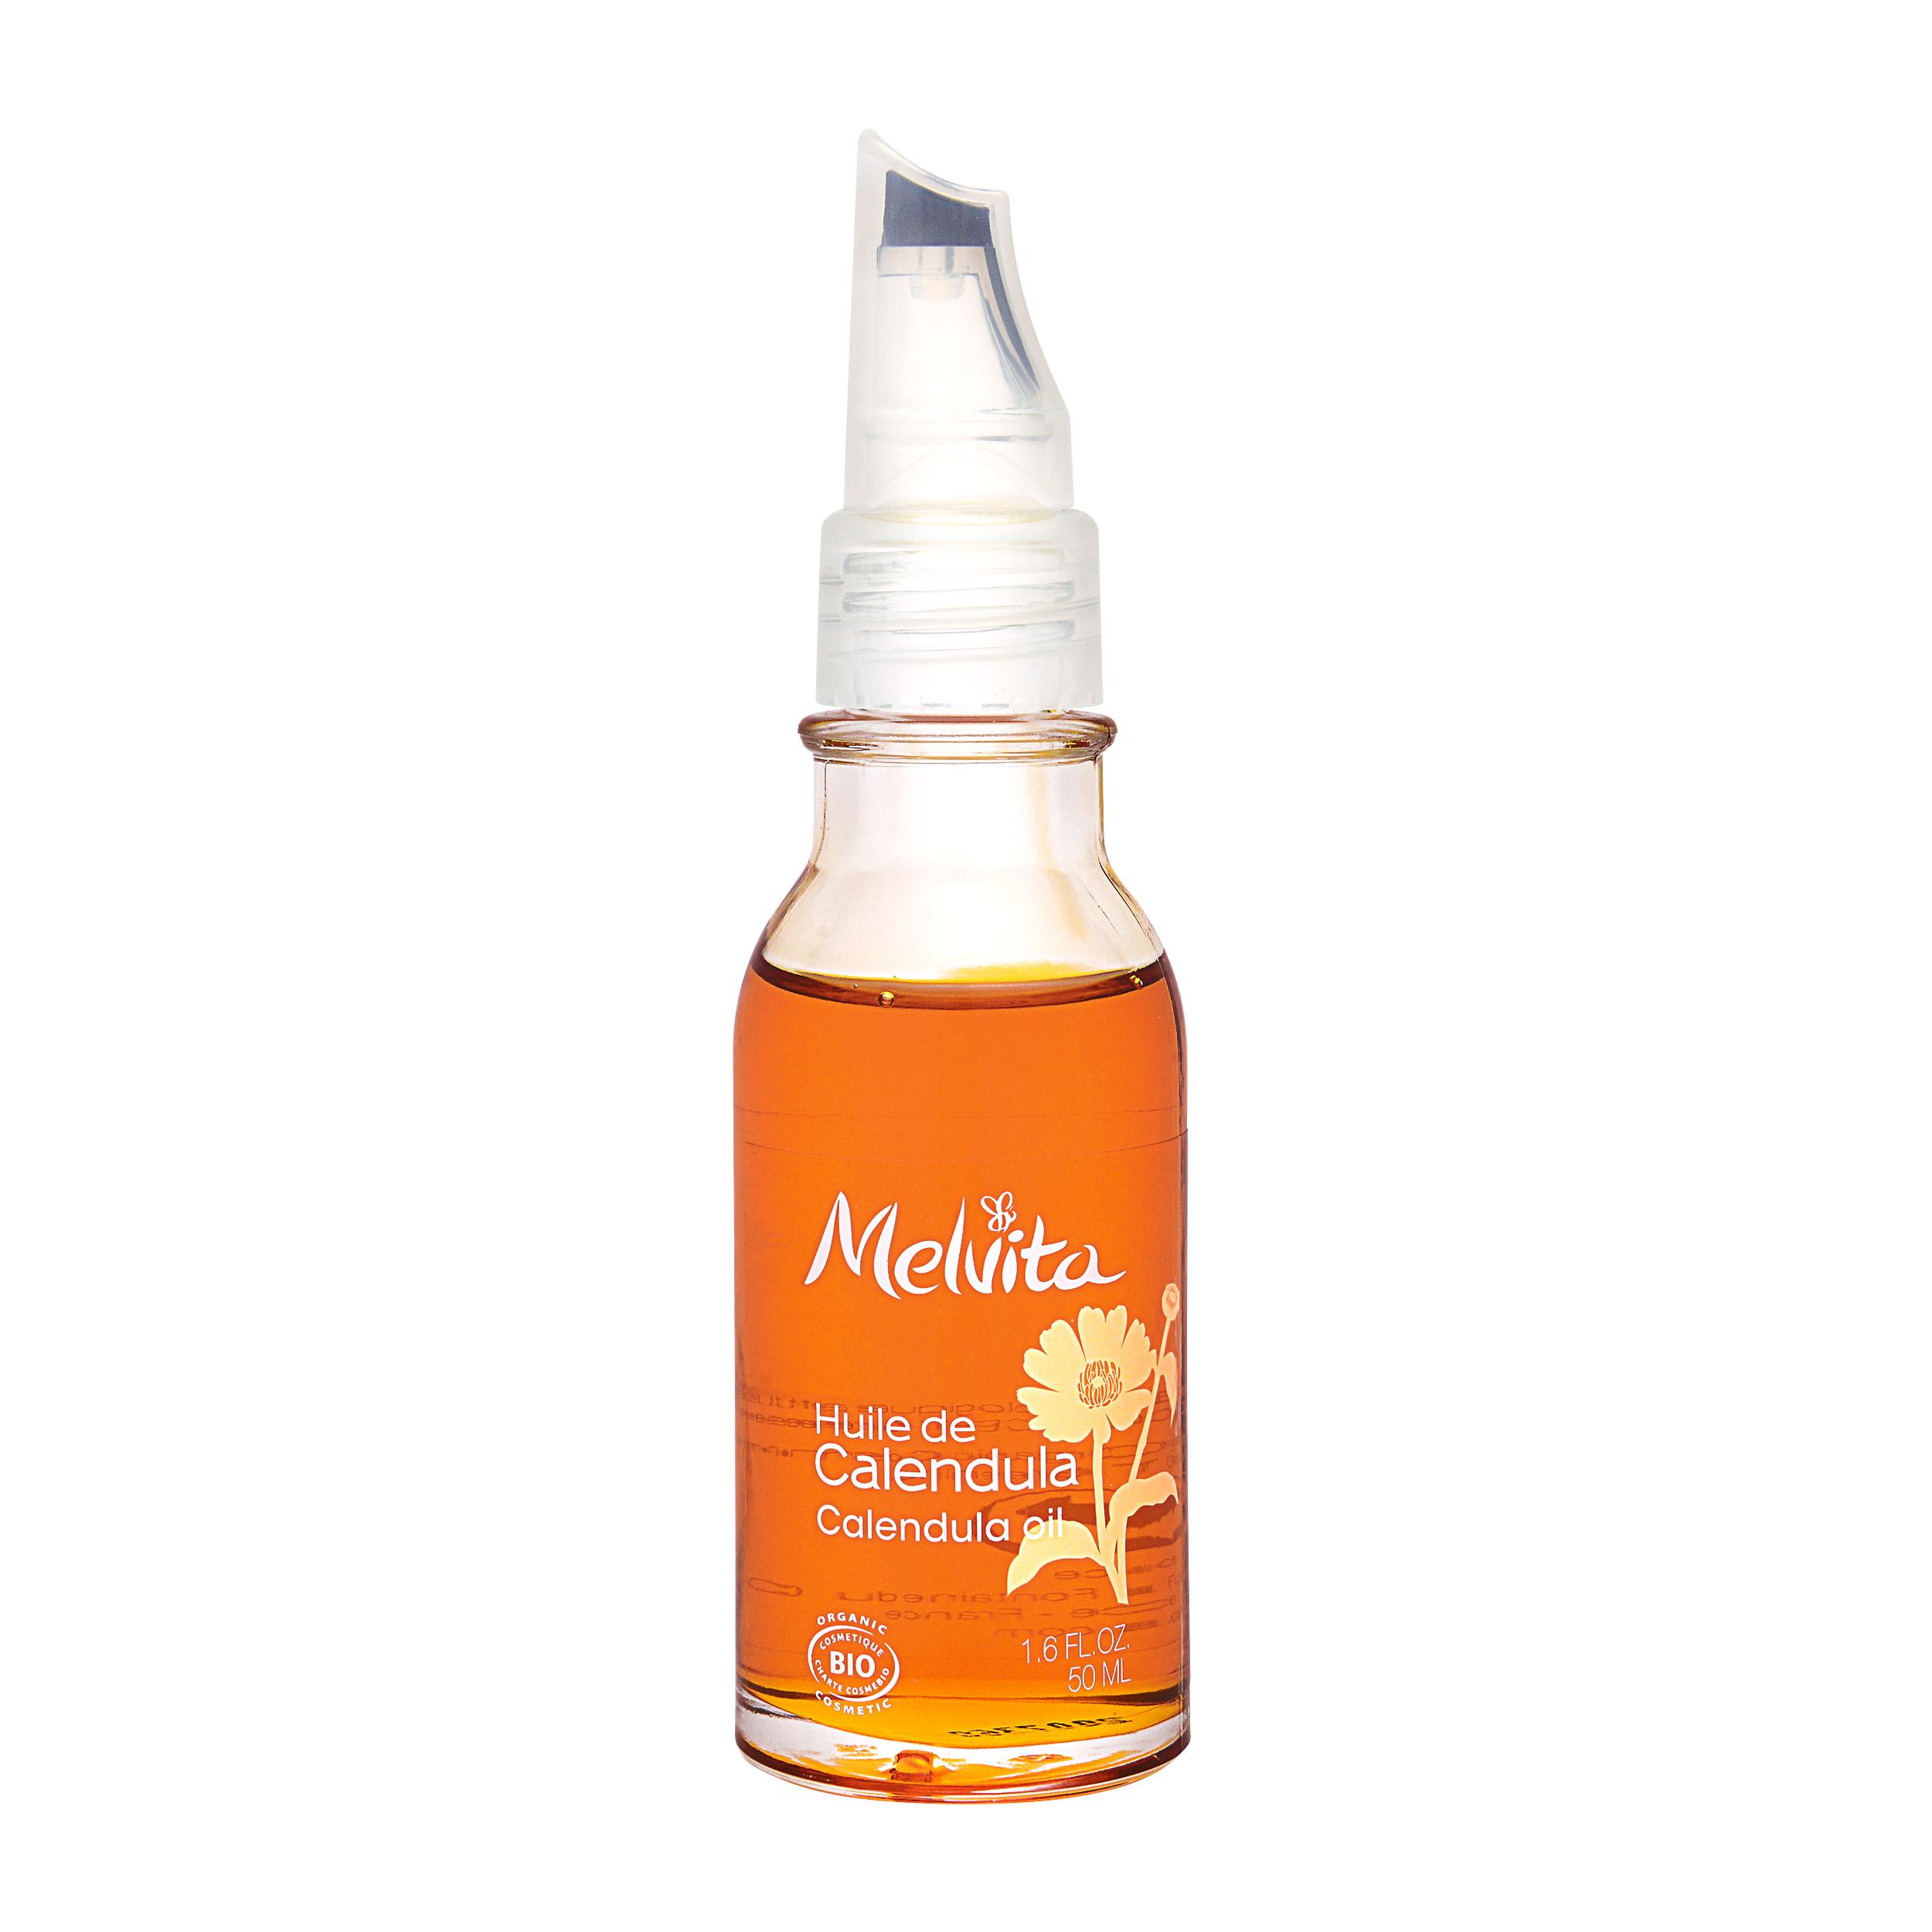 Melvita Calendula Oil 1.7oz, 50ml